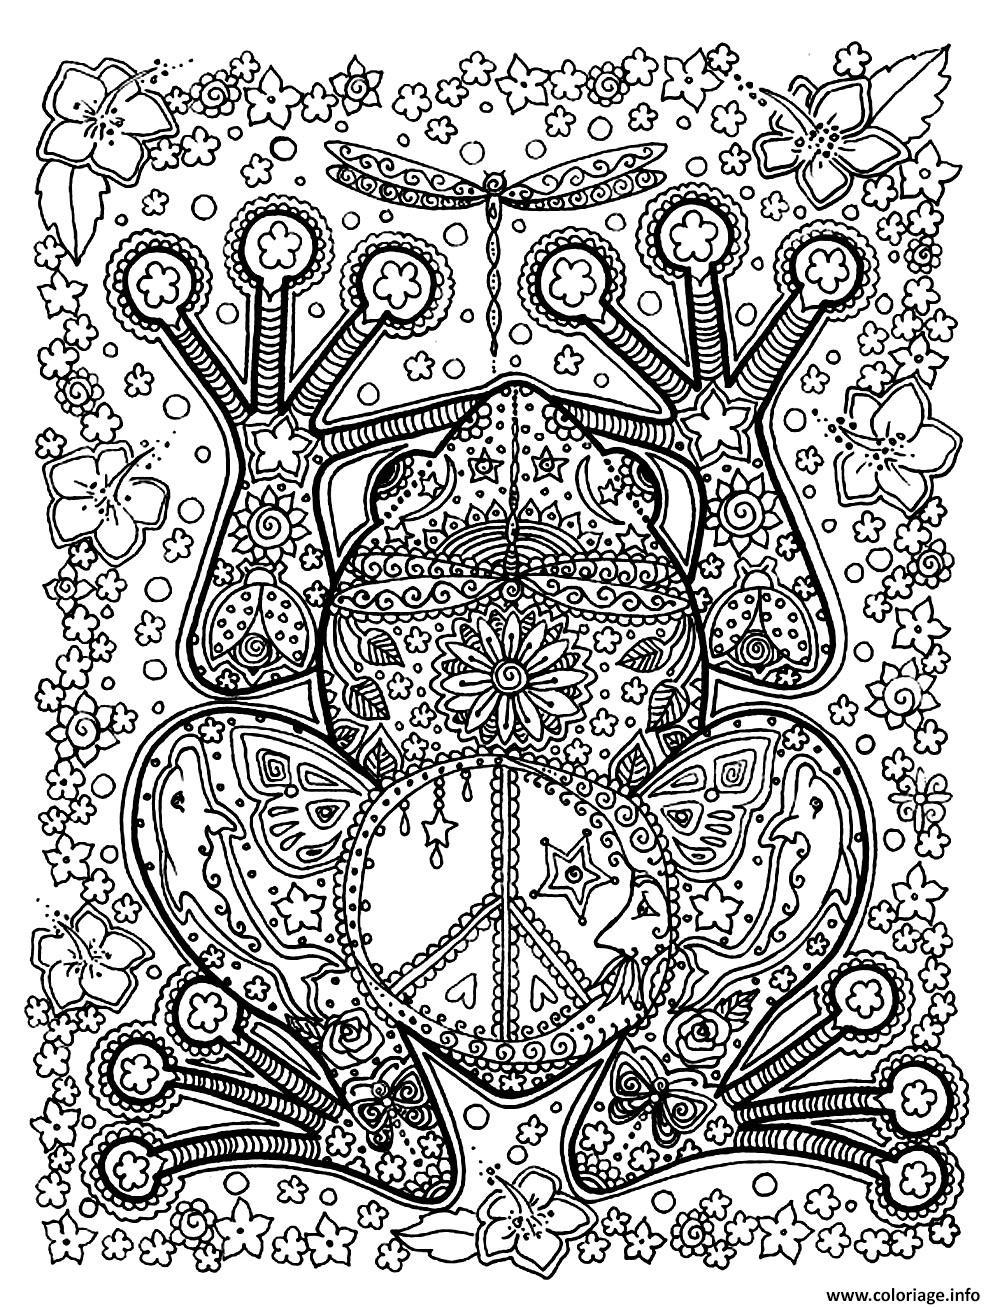 Coloriage adulte animaux grenouille motifs dessin - Grenouille a colorier ...